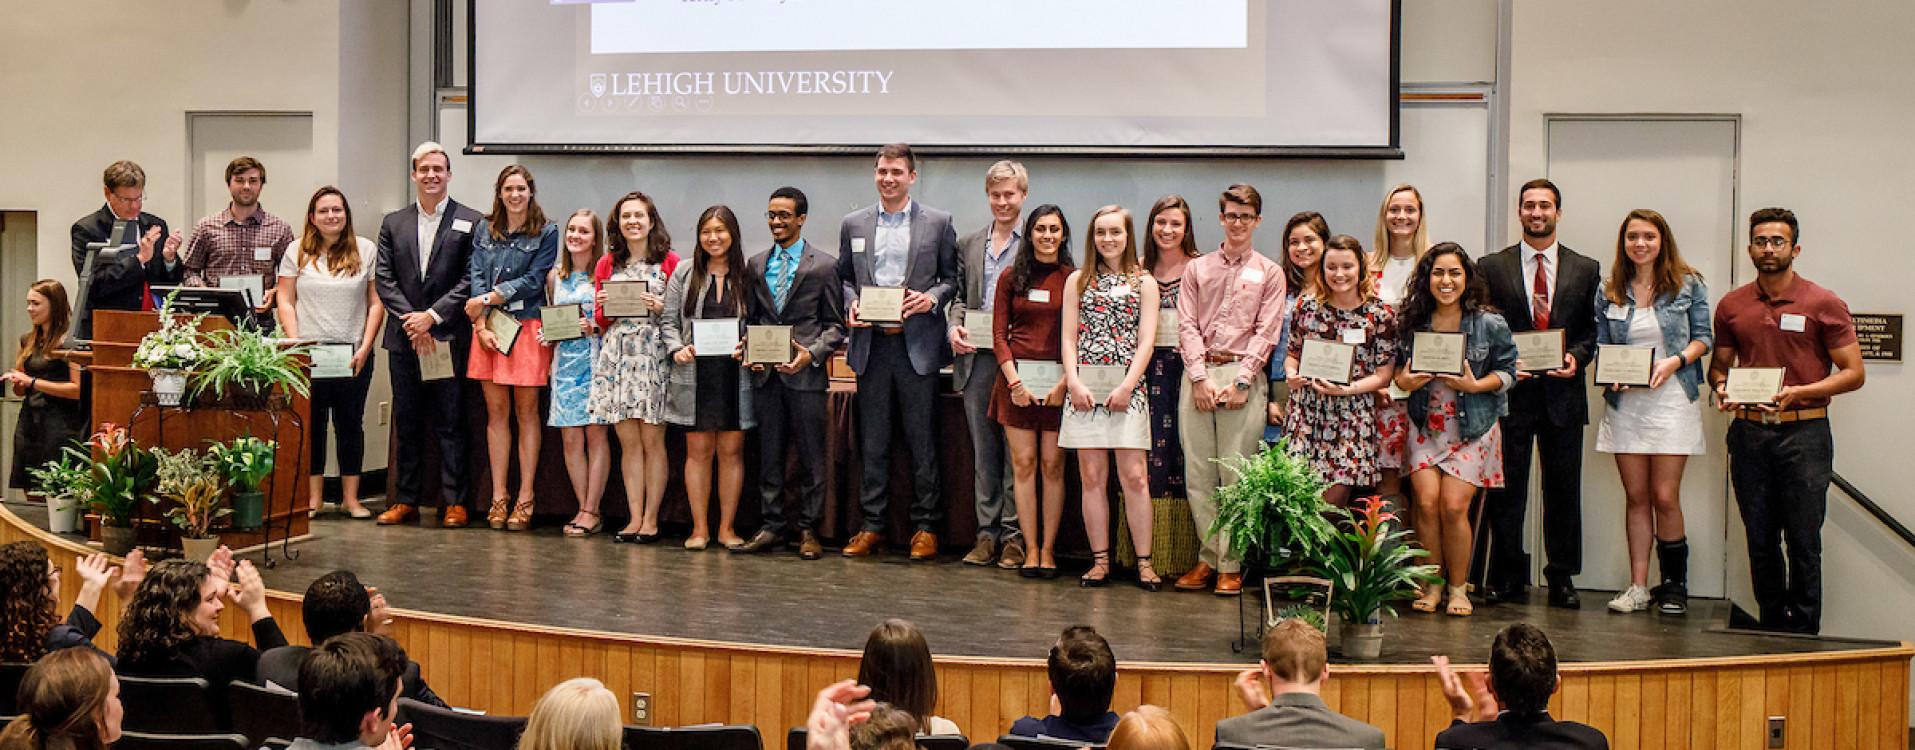 Student Life Leadership Awards Ceremony 2017